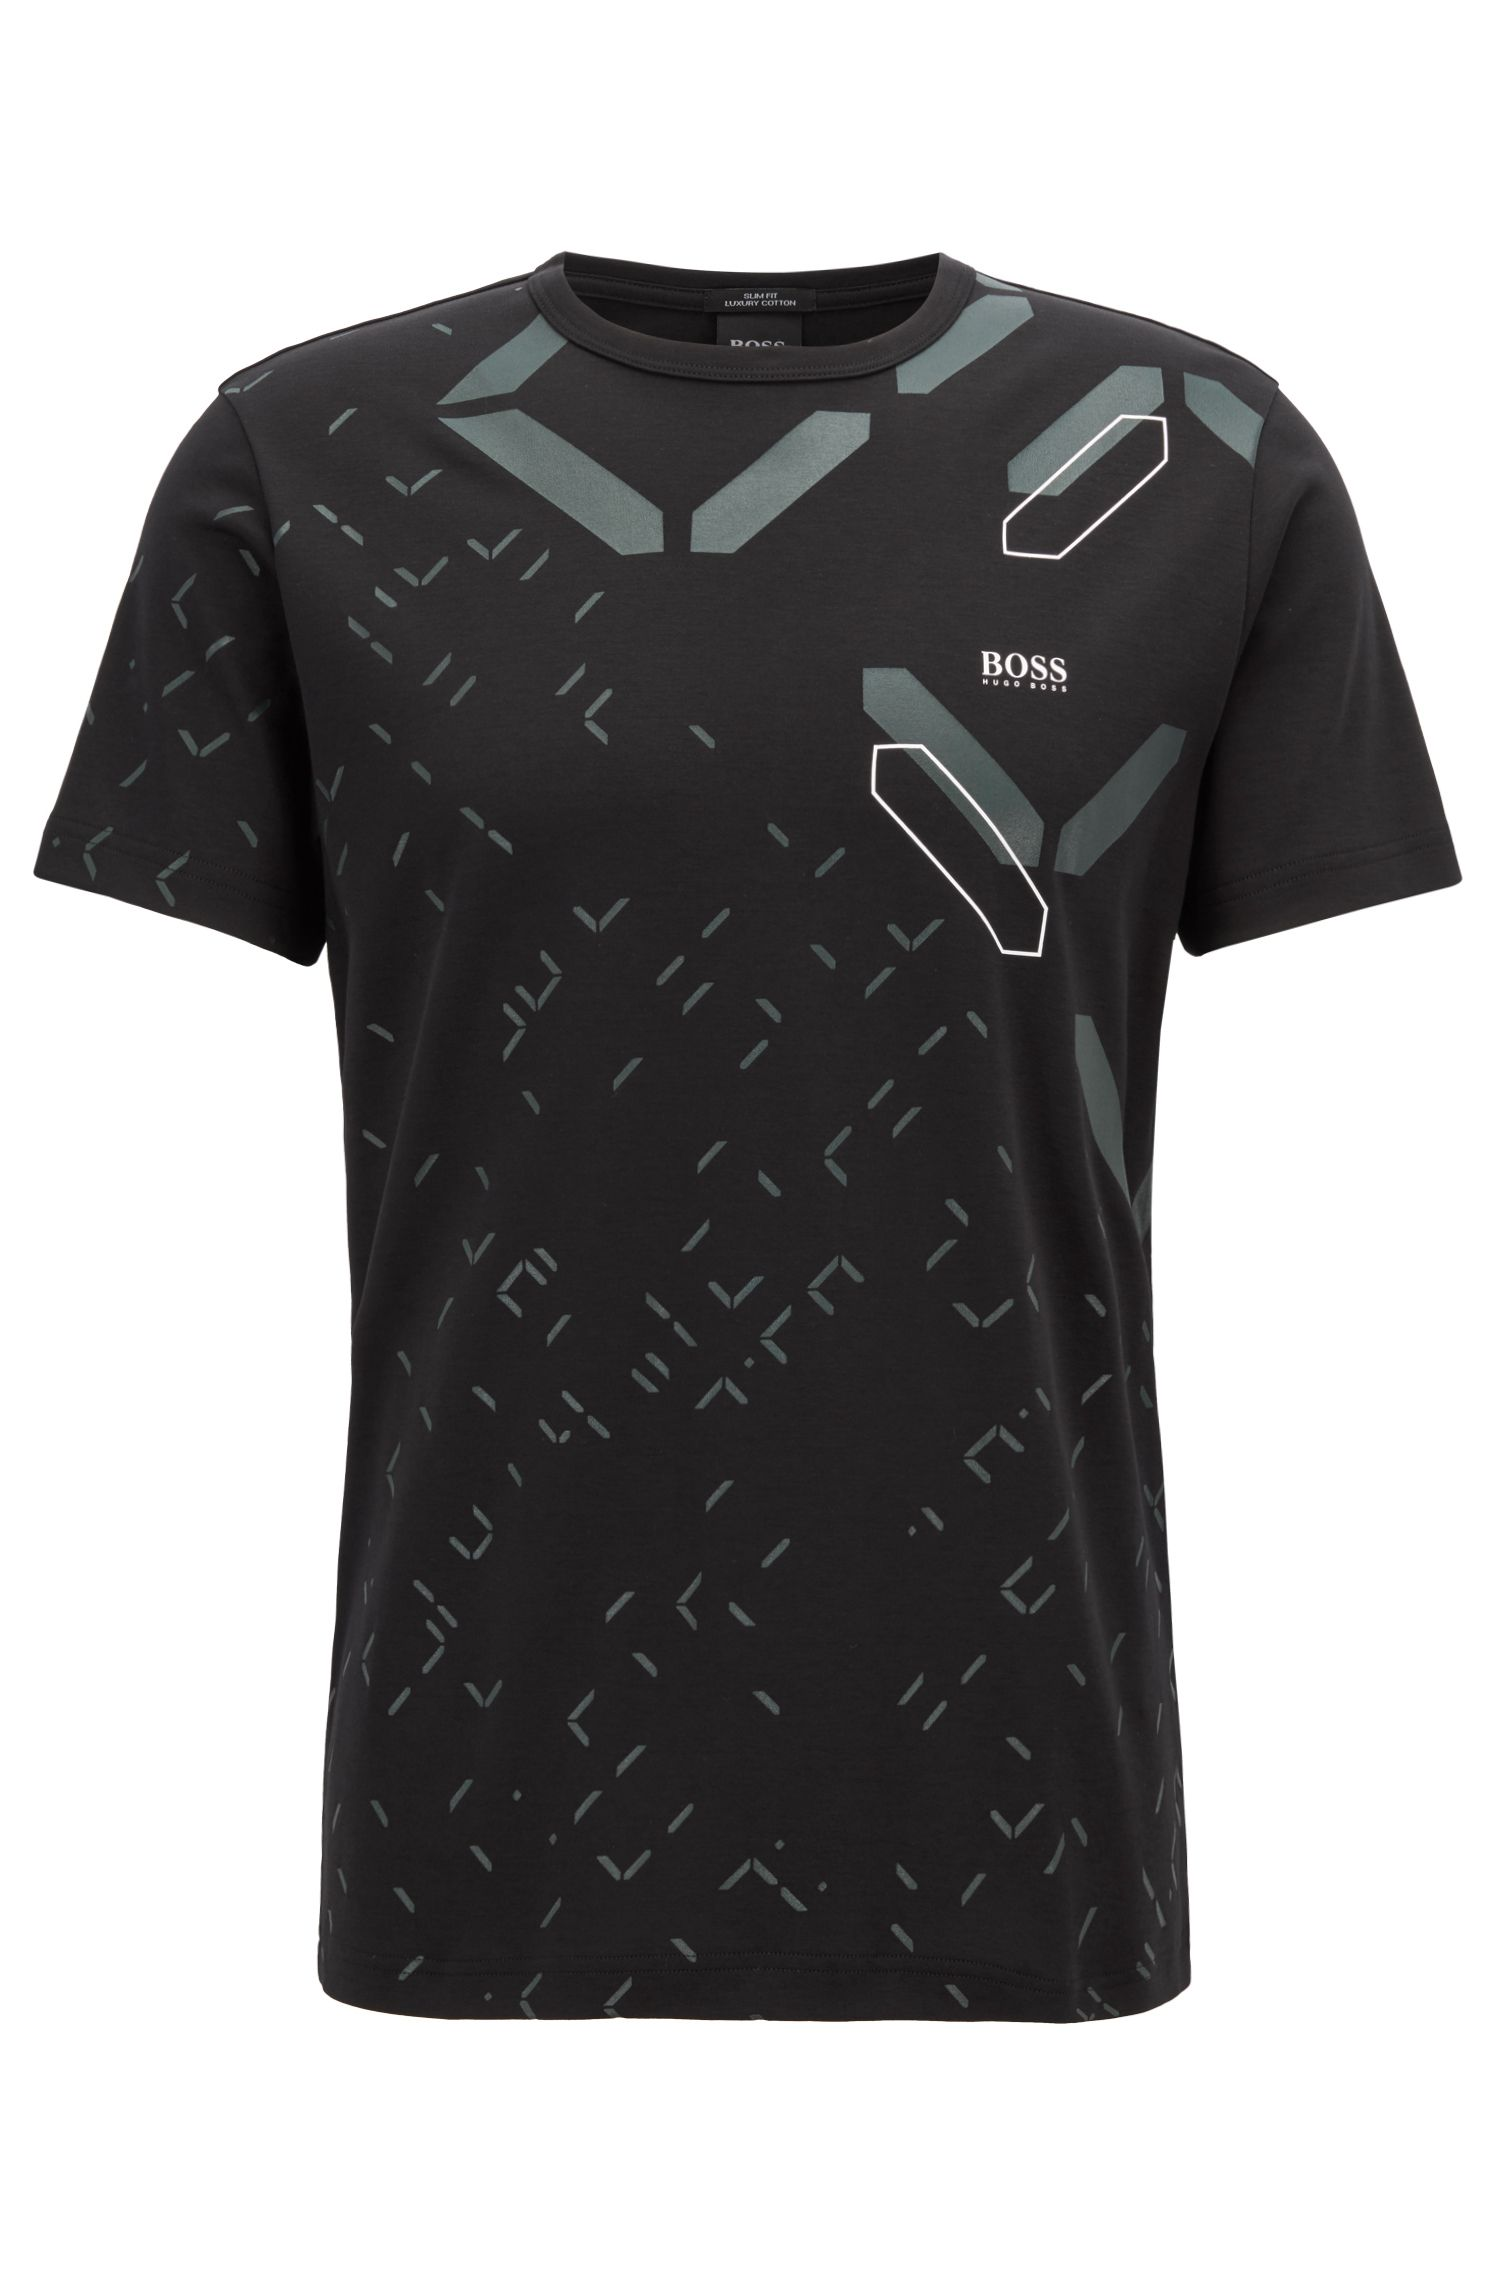 Slim-fit T-shirt with all-over digital-clock artwork, Black